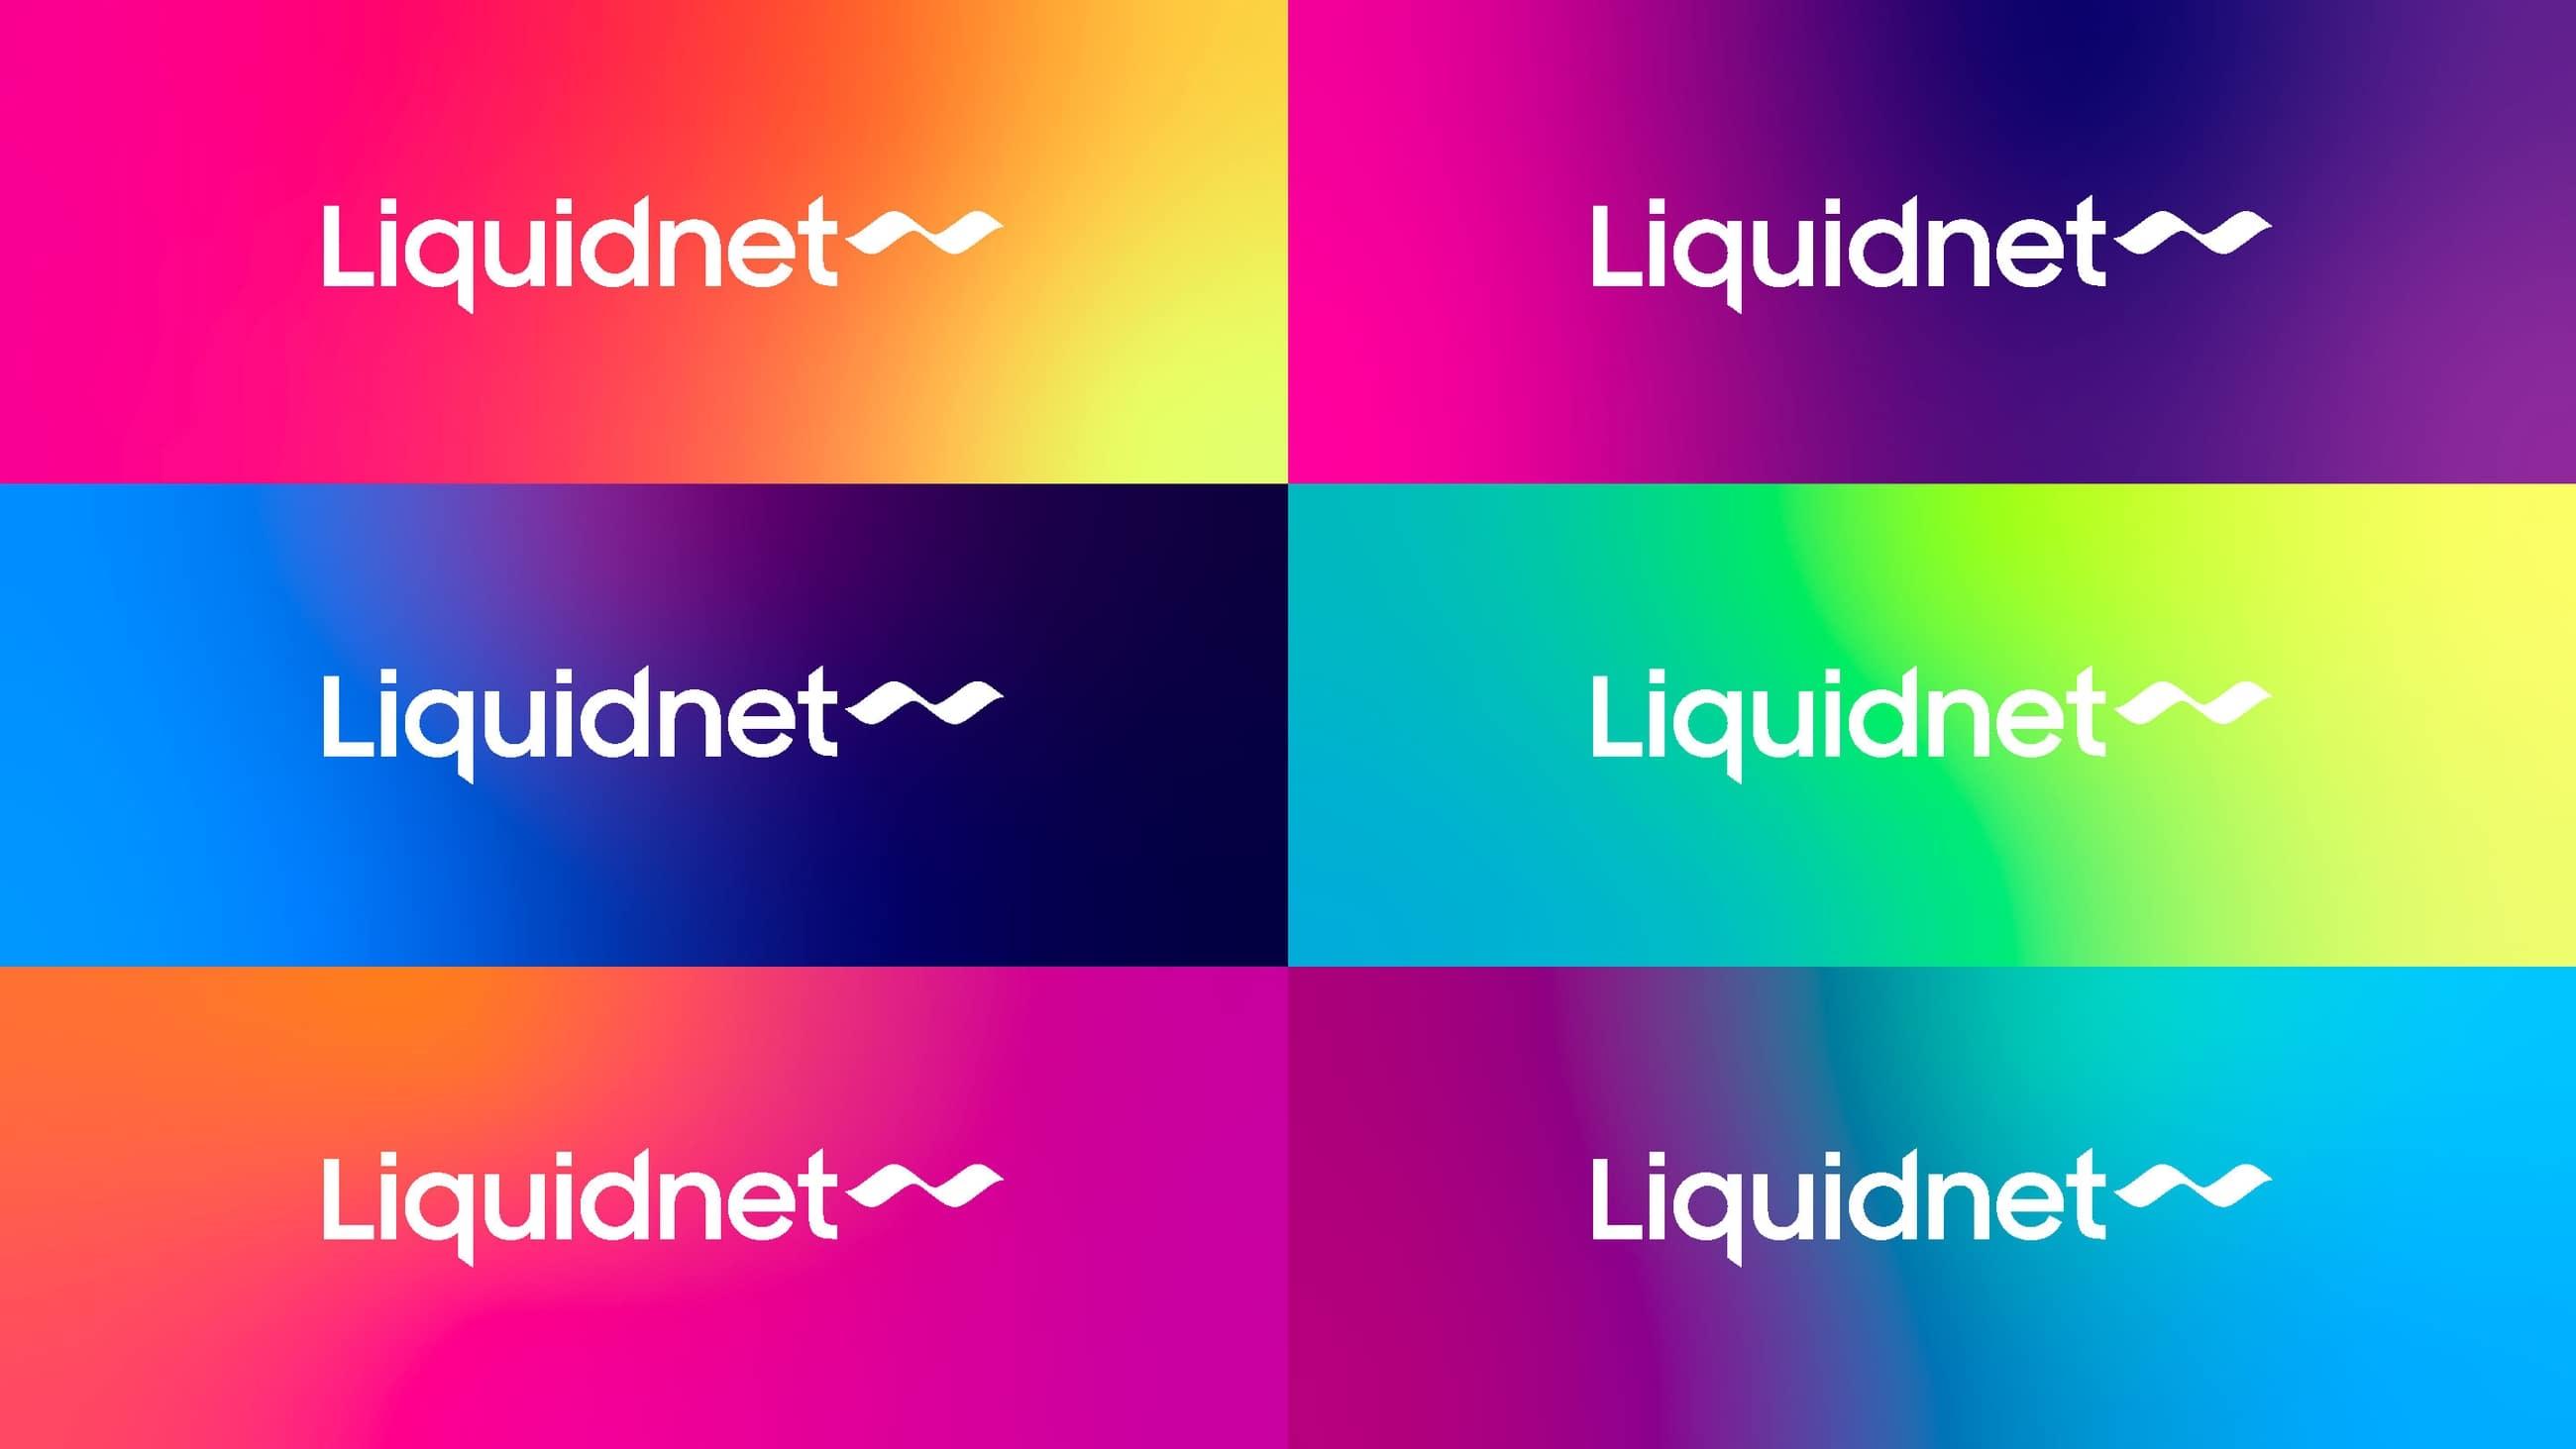 HIERONYMUS_Liquidnet_Colors-p-2600